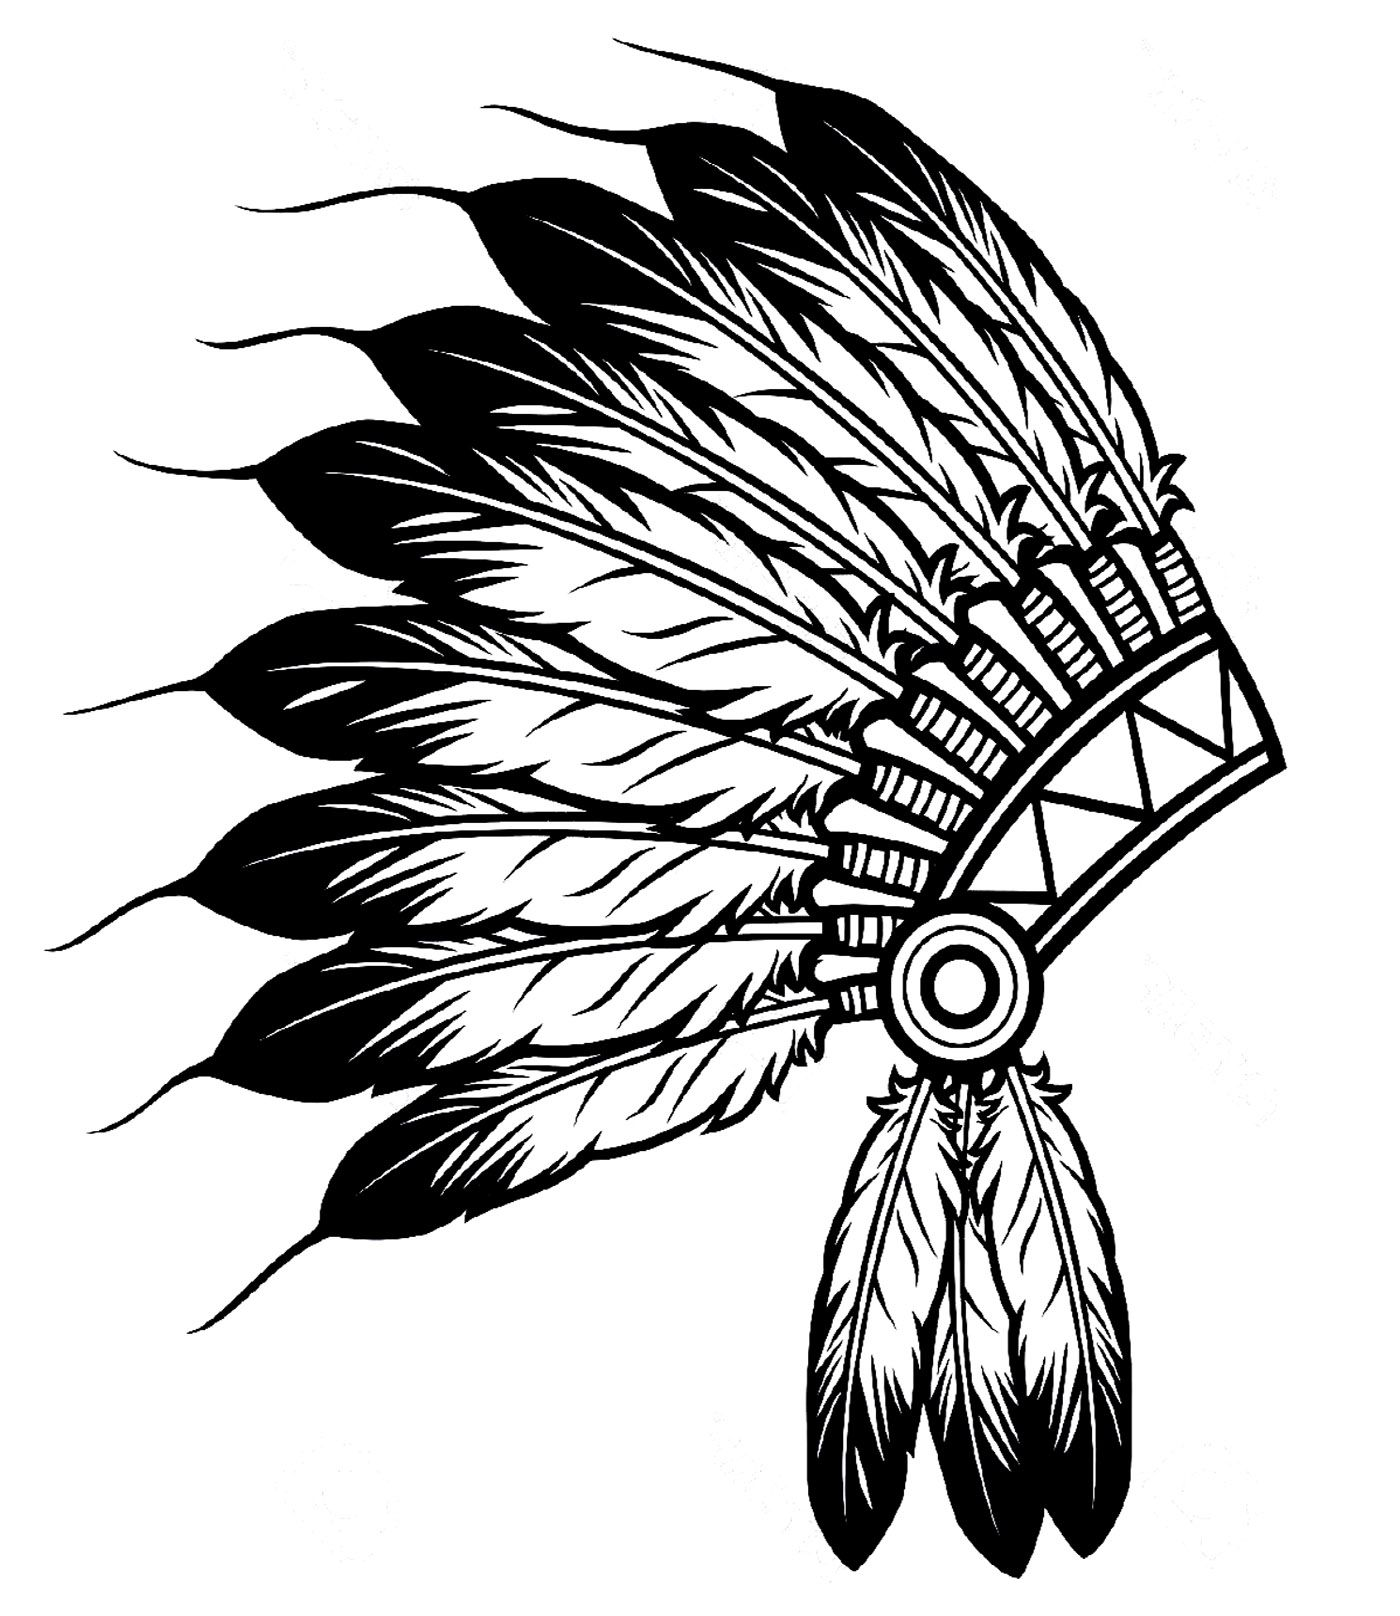 native american headdress drawing at getdrawings com free for rh getdrawings com indian feather headdress clipart indian headdress clipart free